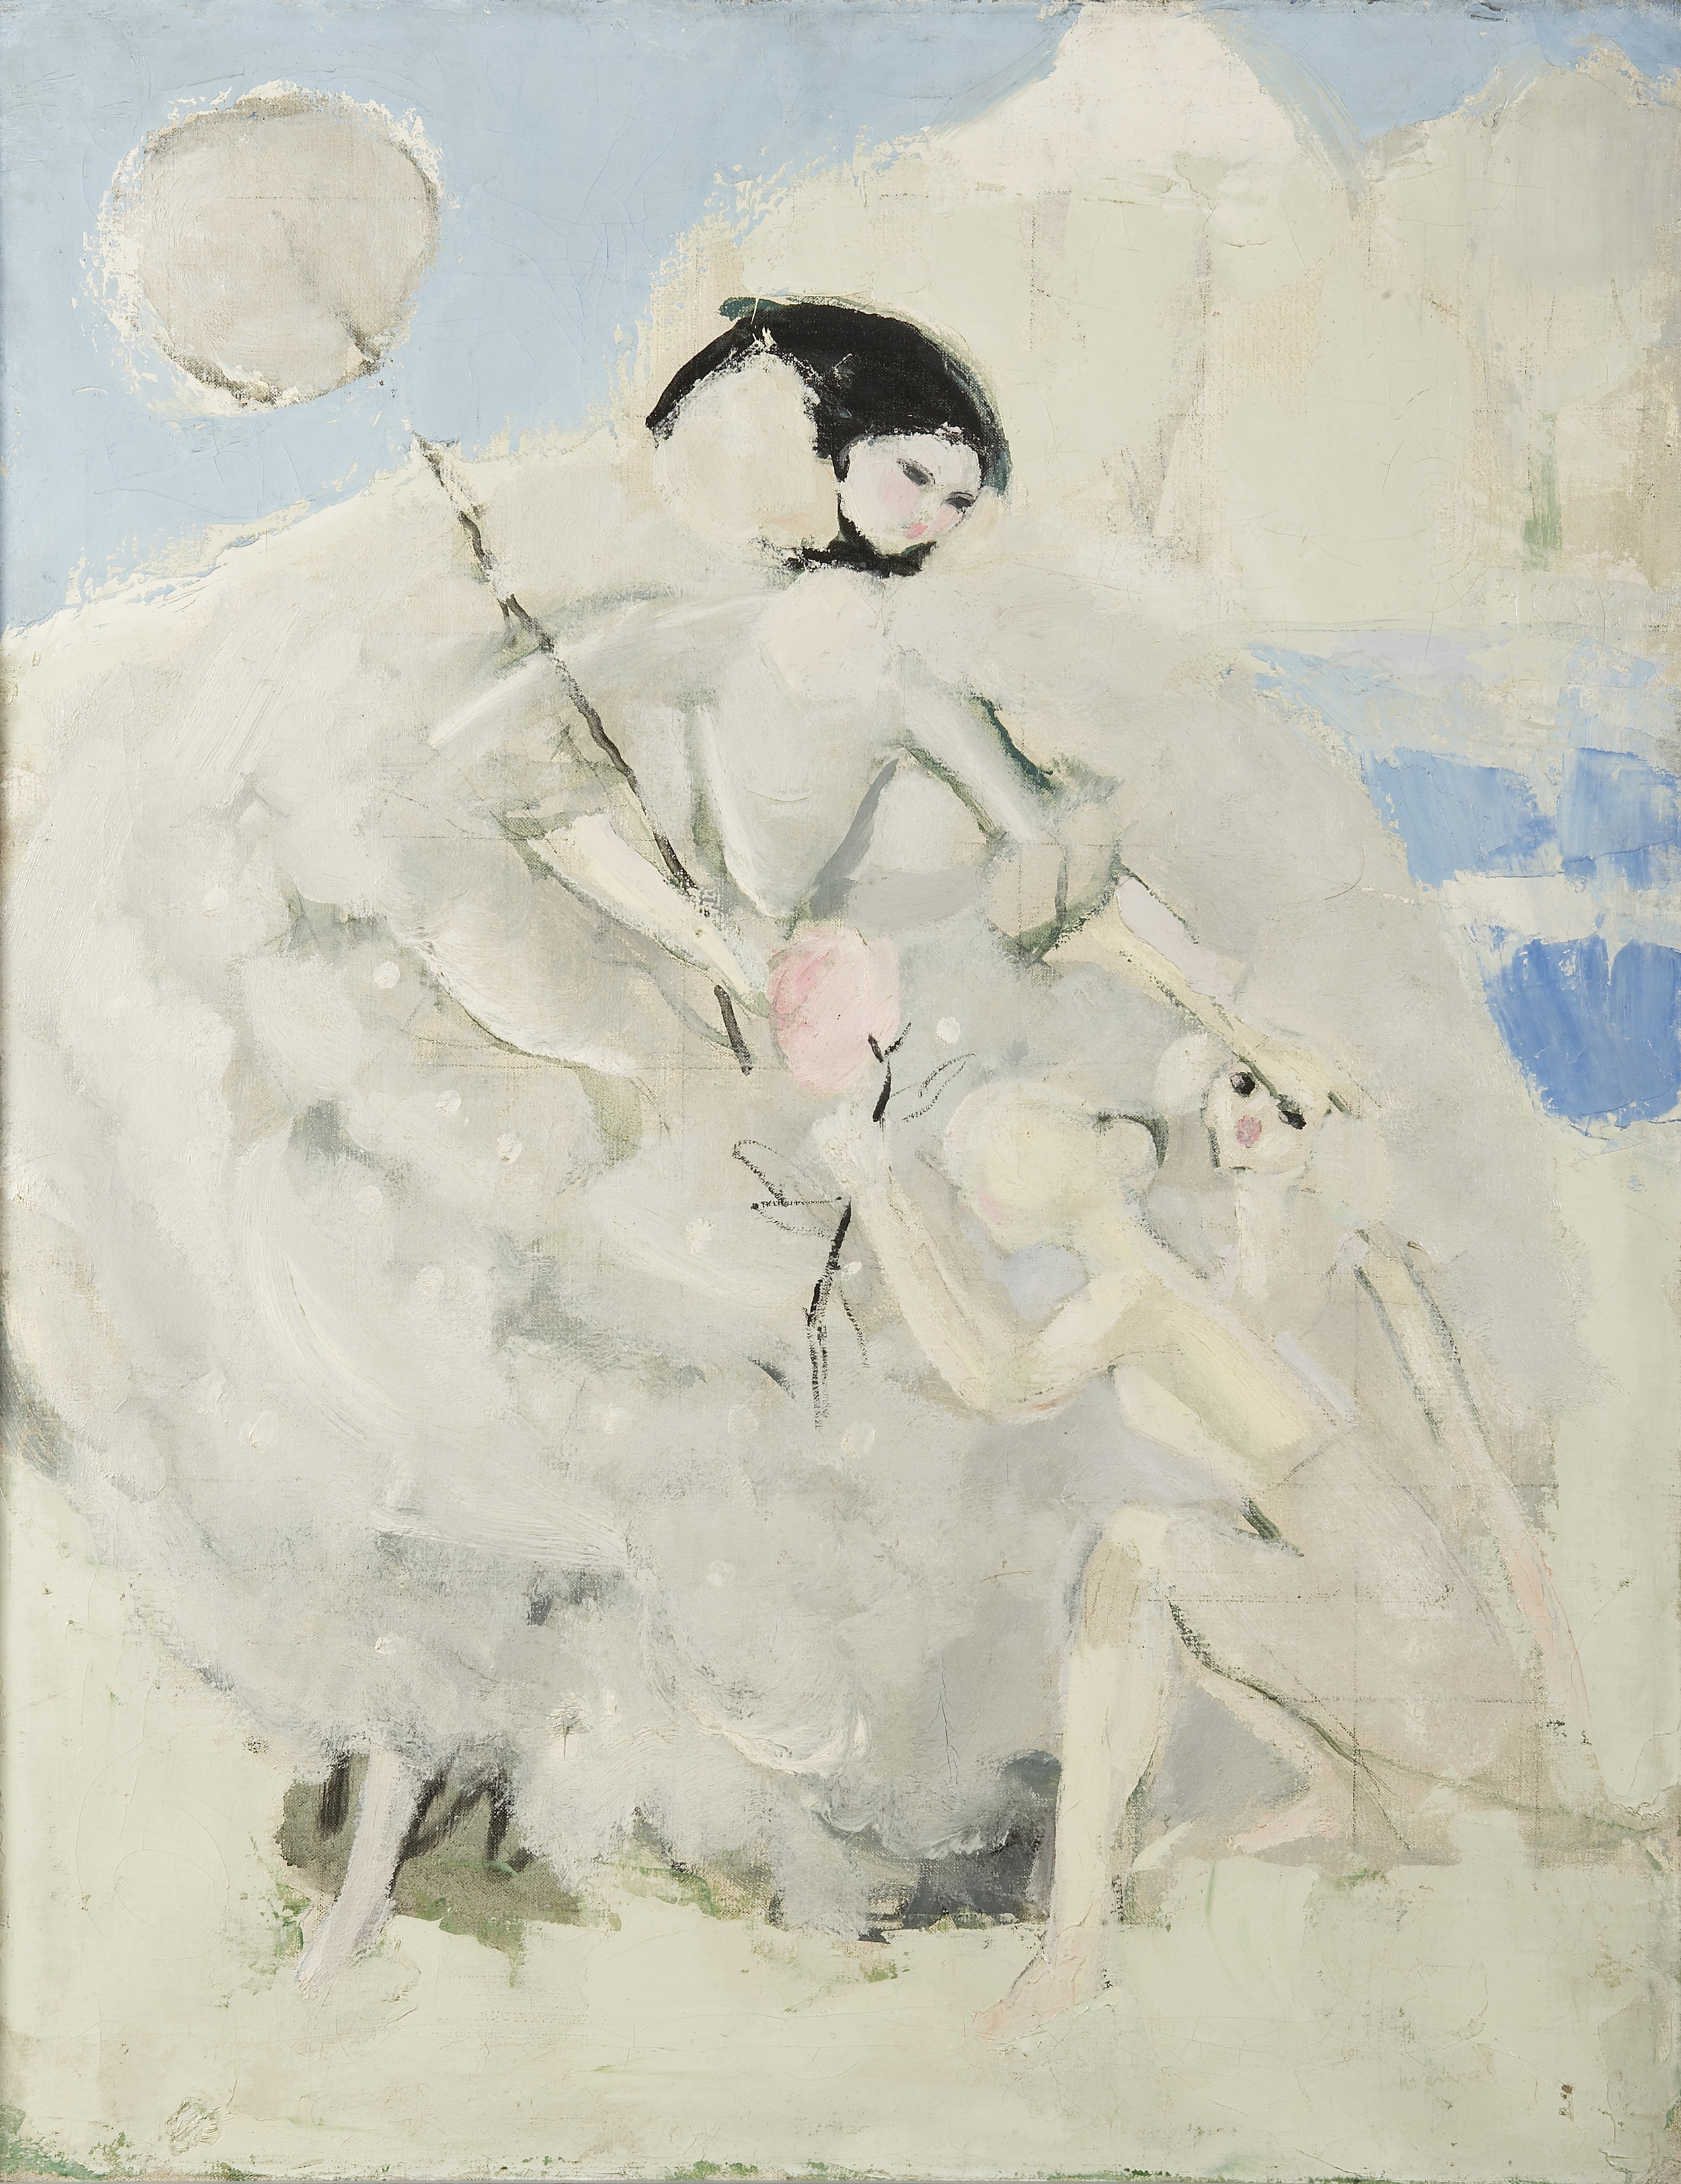 Cendrillon, Jacqueline Marval. Huile sur toile.